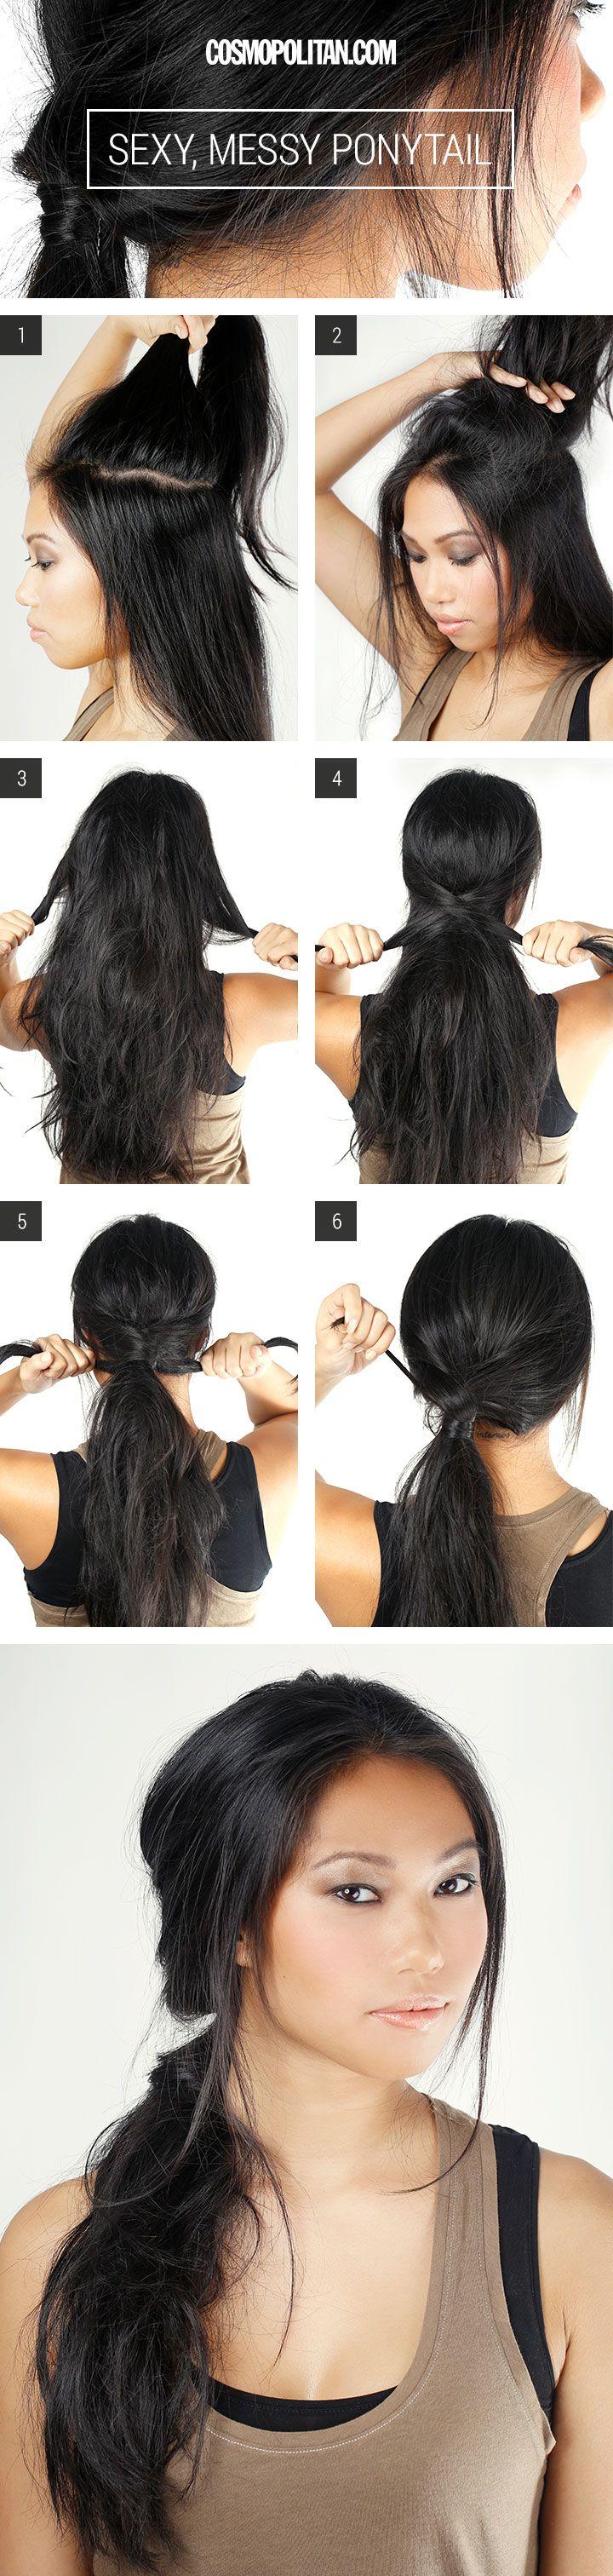 174 best Hair Inspiration images on Pinterest